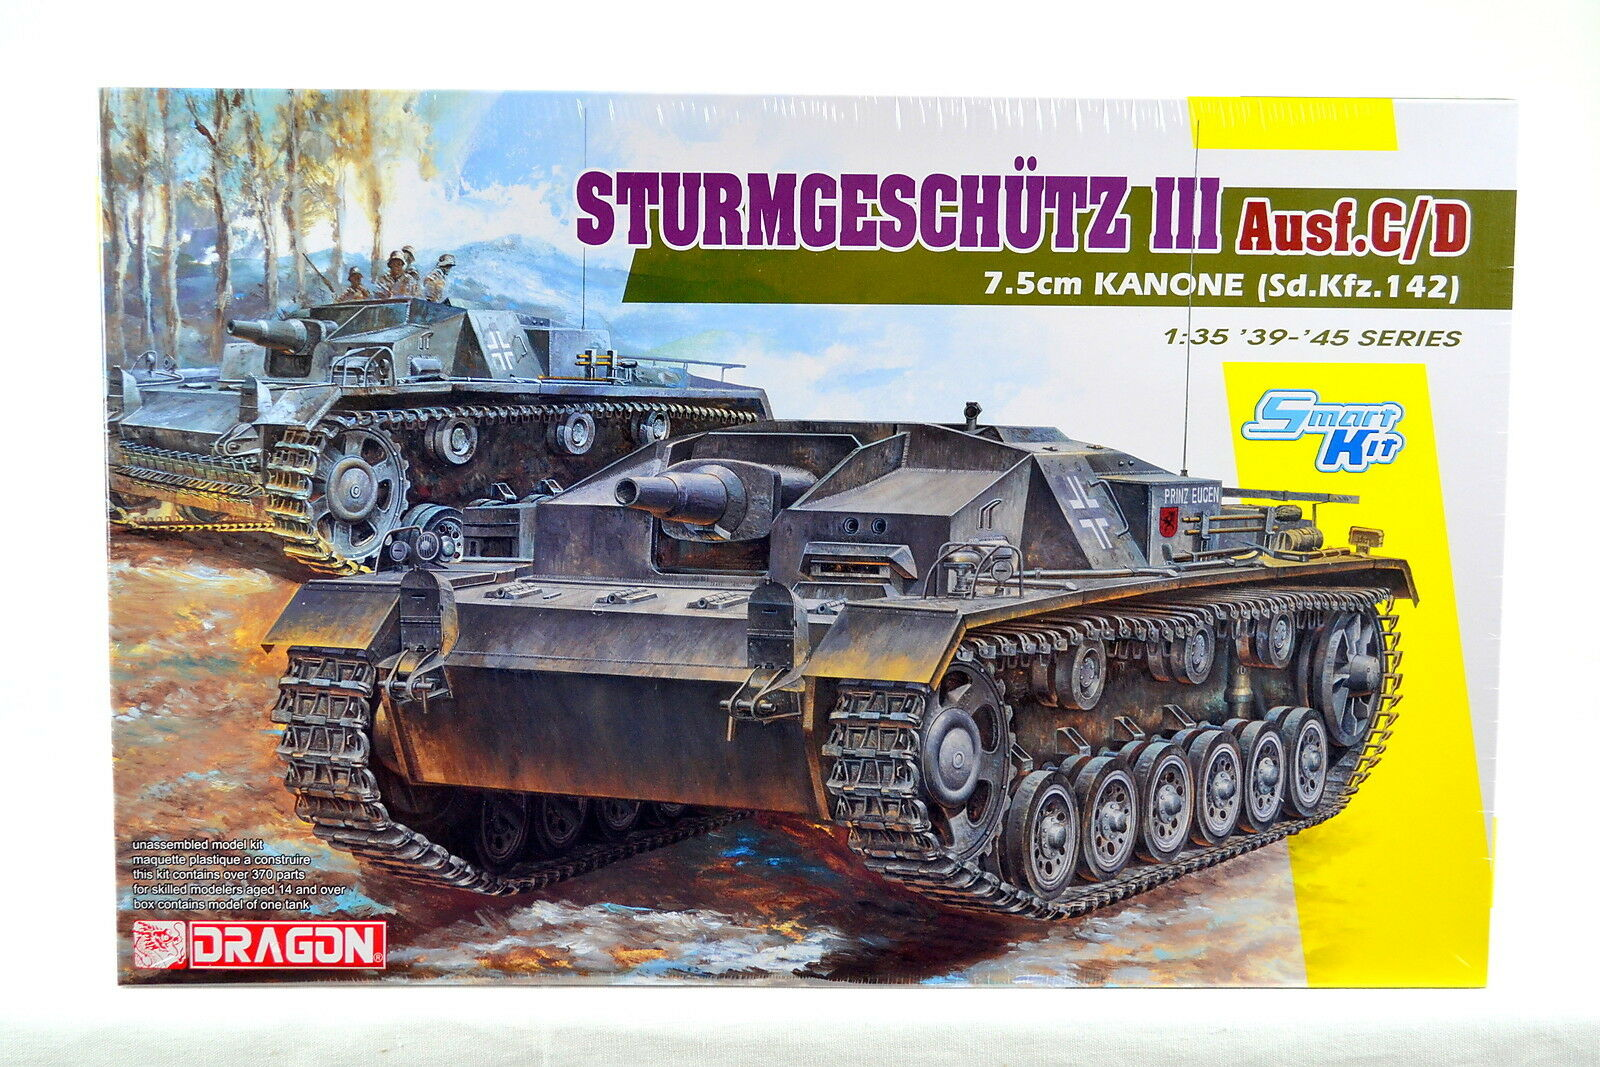 Dragon 6851 1 35 STURMGESCHÜTZ 7.5cm KANONE (Sd.Kfz.142) Ausf.C D (Smart kit)